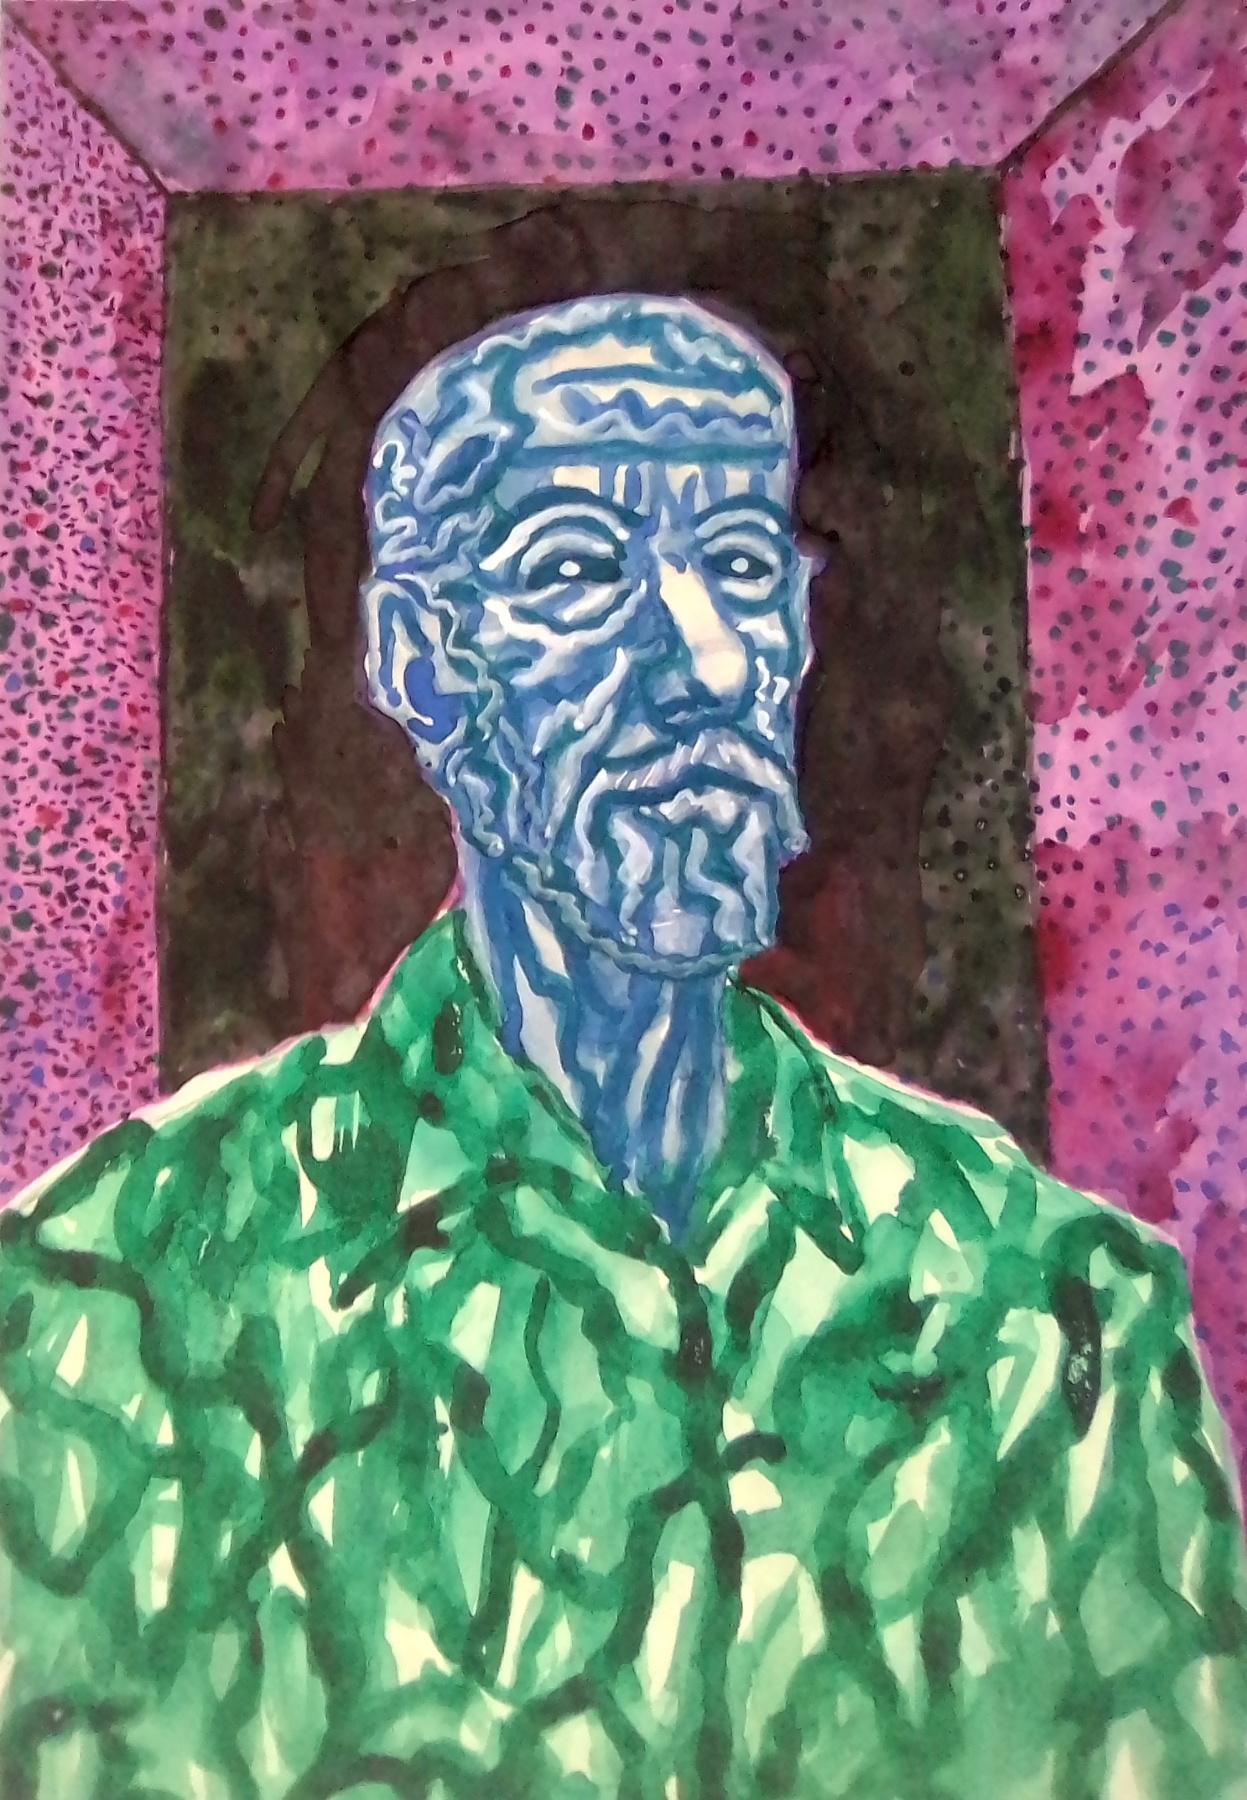 Вячеслав Коренев. Portrait of an old man